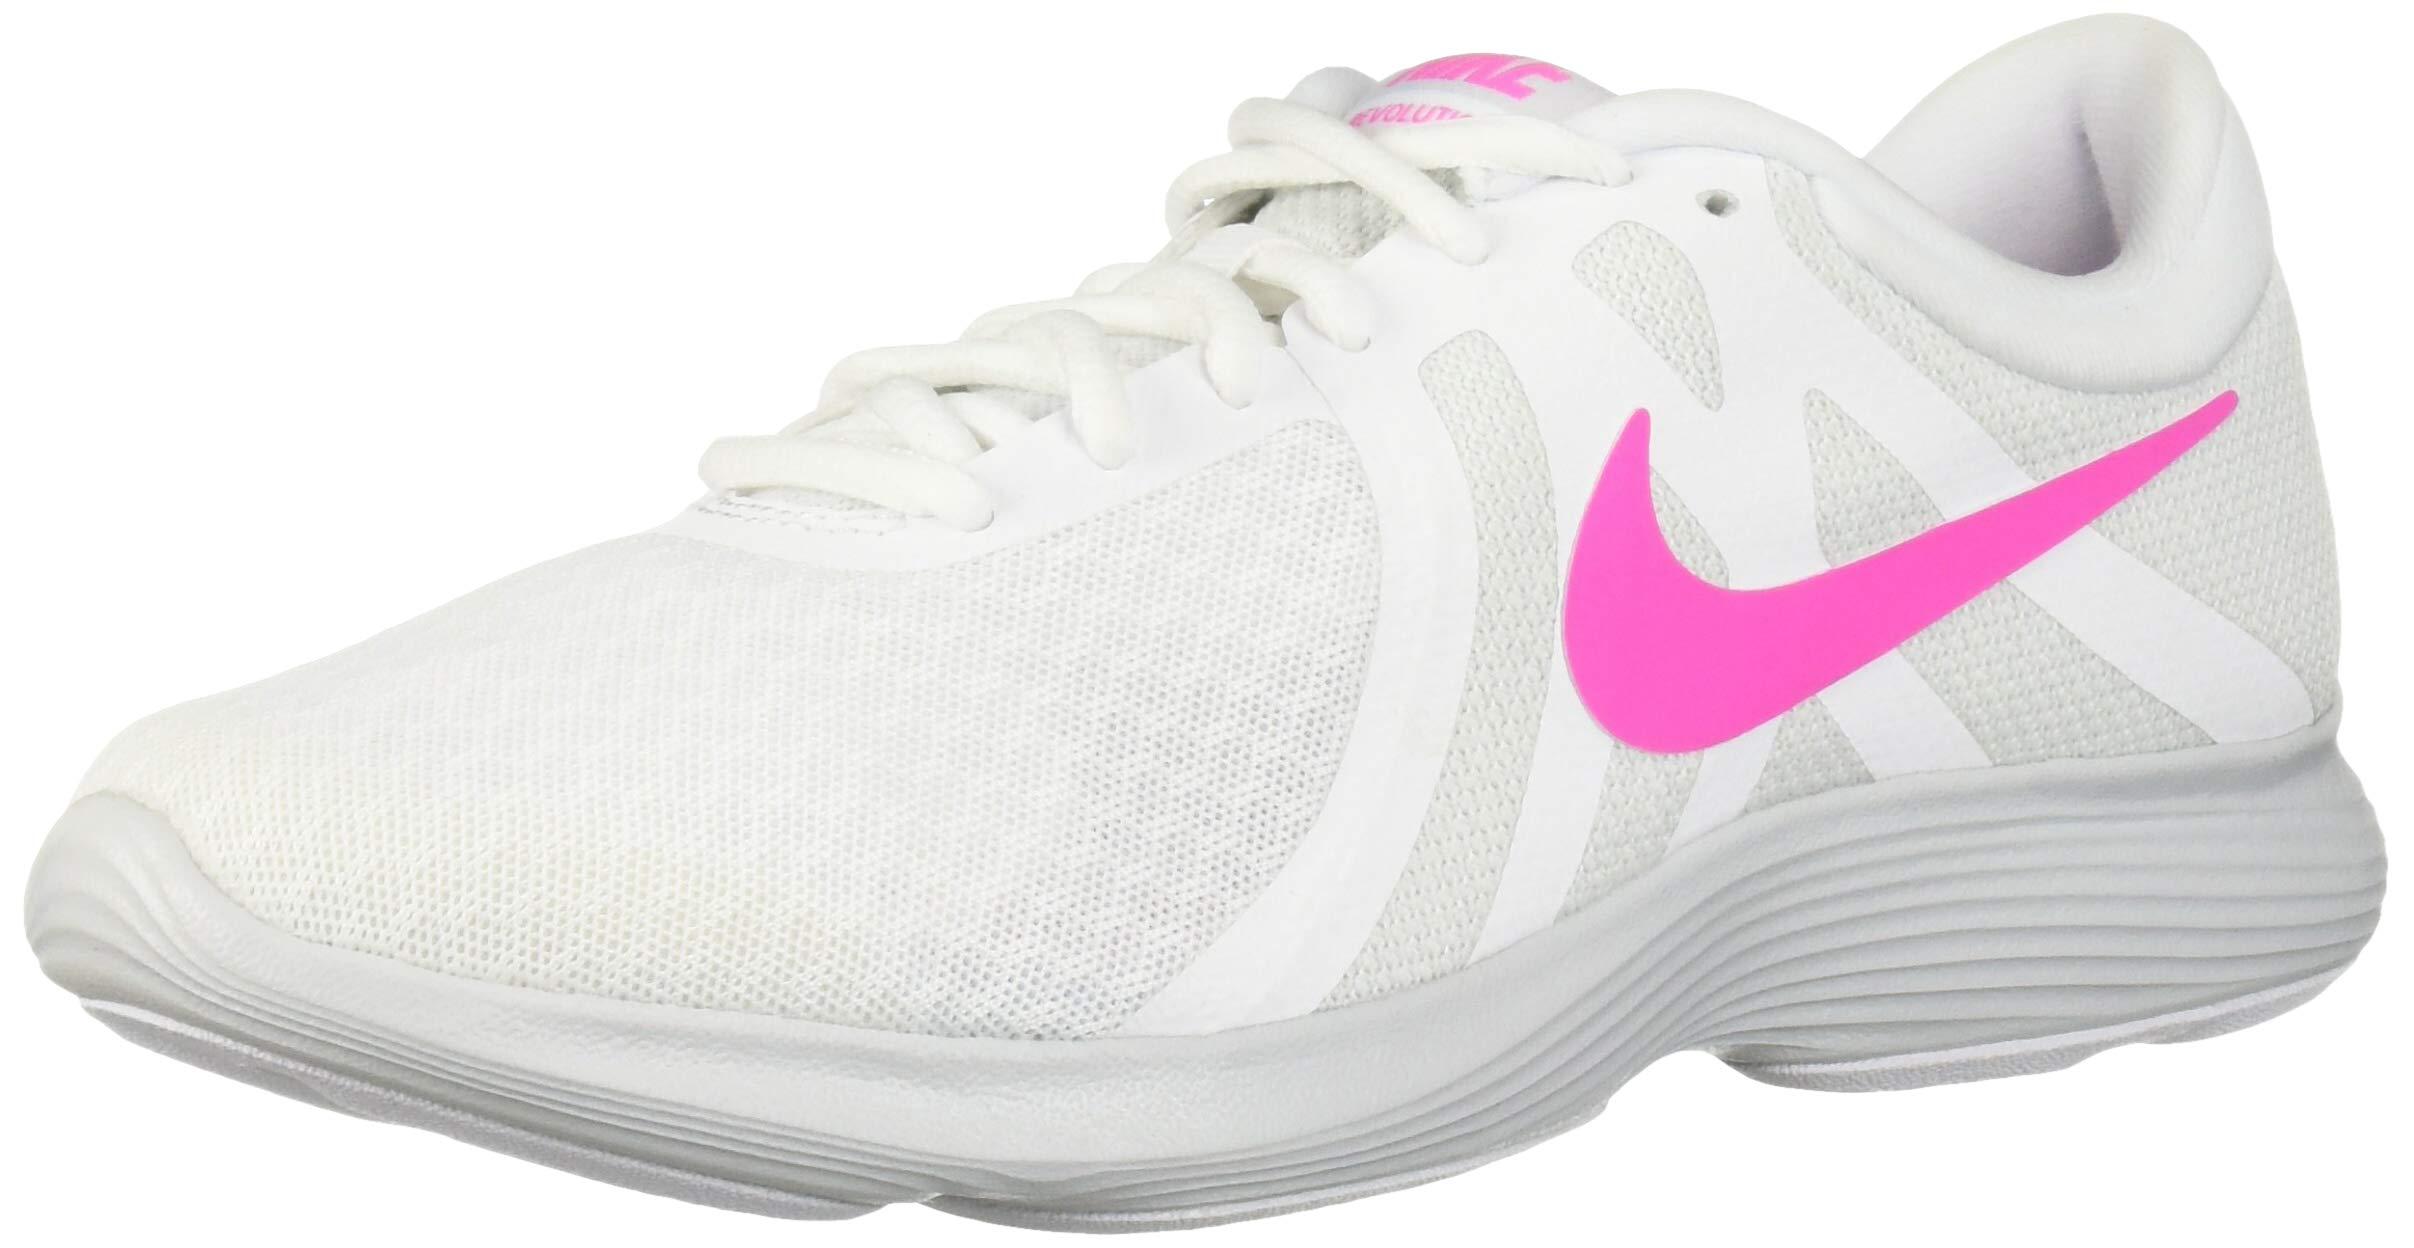 Nike Women's Revolution 4 Running Shoe, White/Laser Fuchsia - Pure Platinum, 5 Regular US